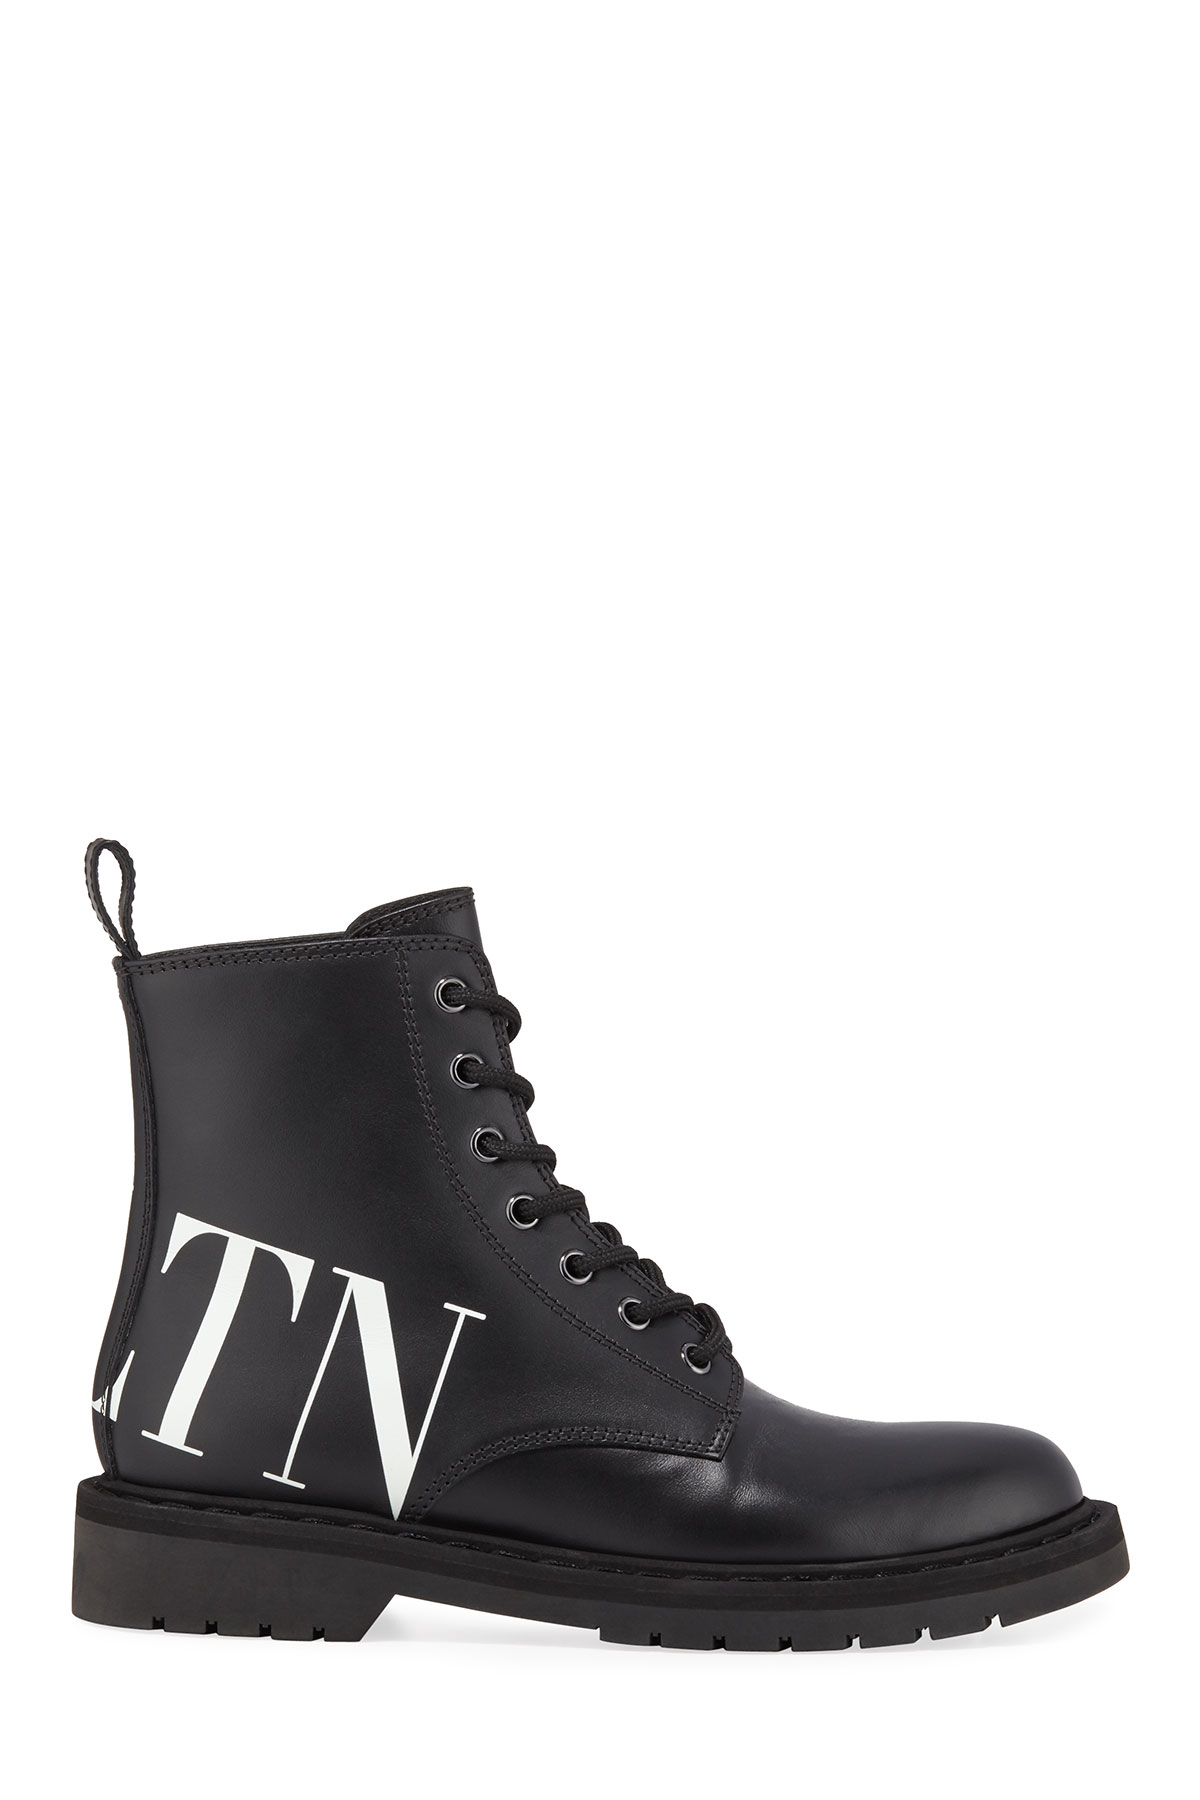 75fc1e29d2011 Valentino Garavani VLTN Leather Combat Boots